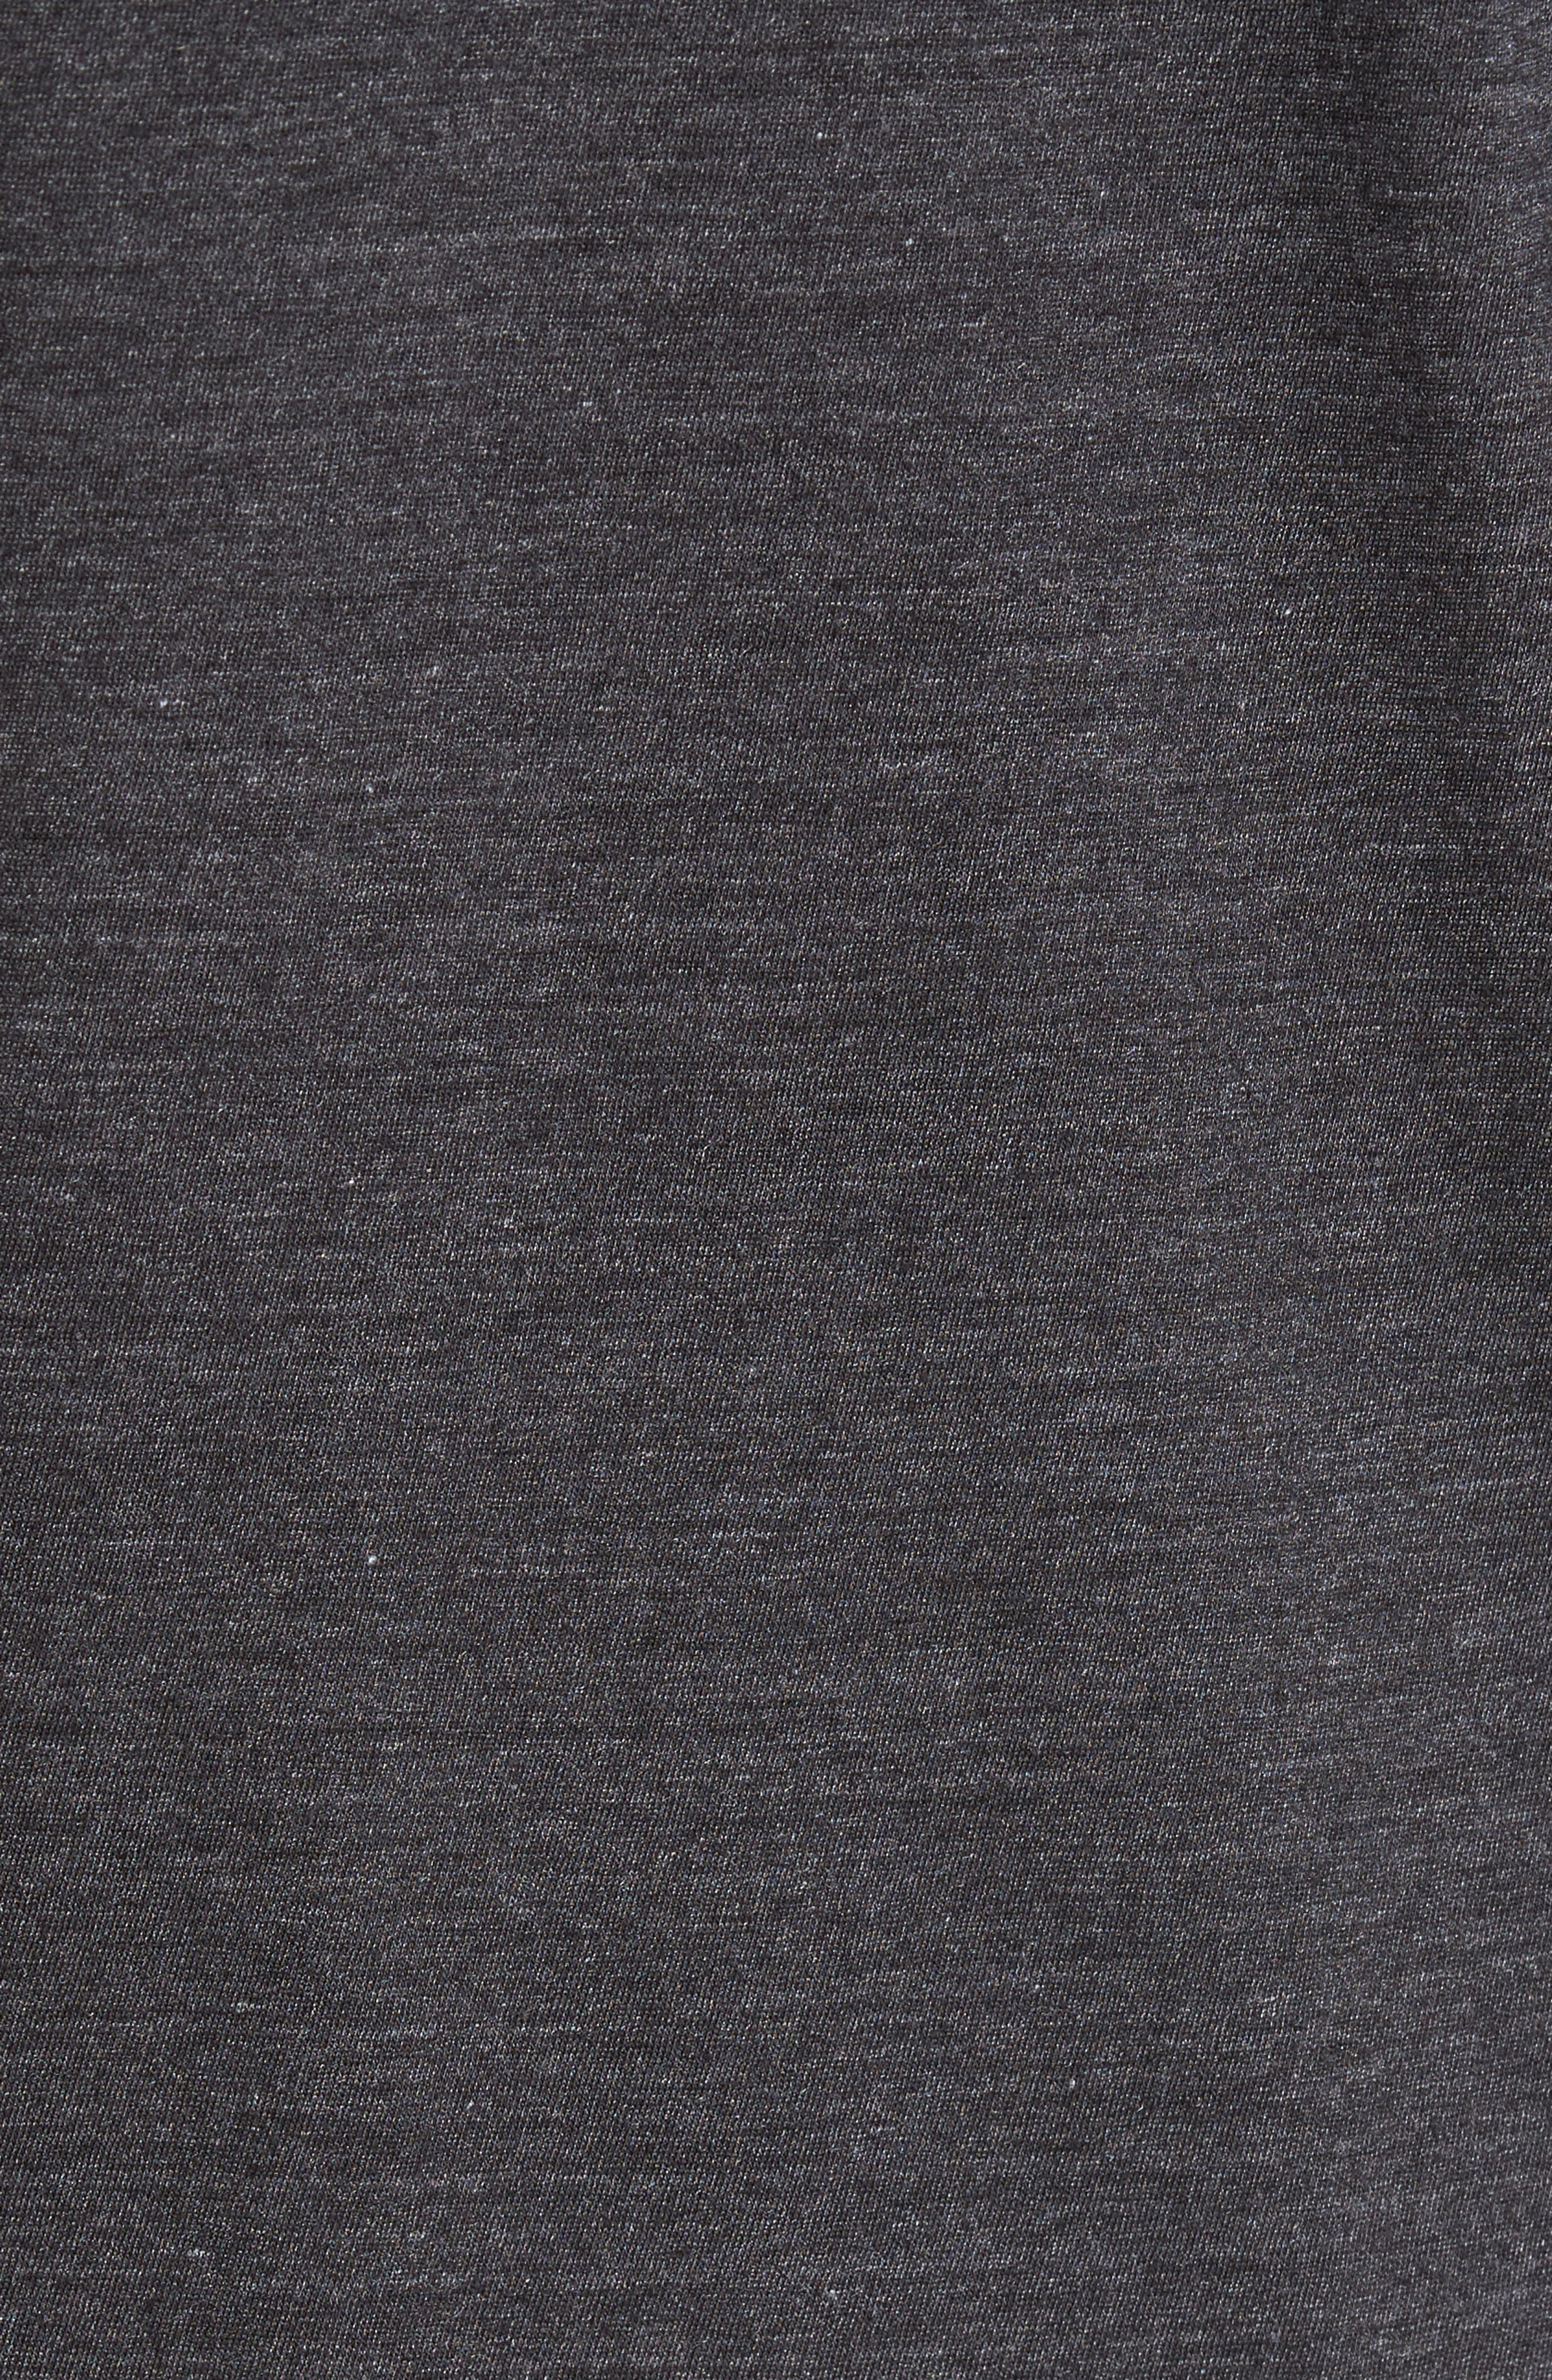 I'm So Hood T-Shirt,                             Alternate thumbnail 5, color,                             002